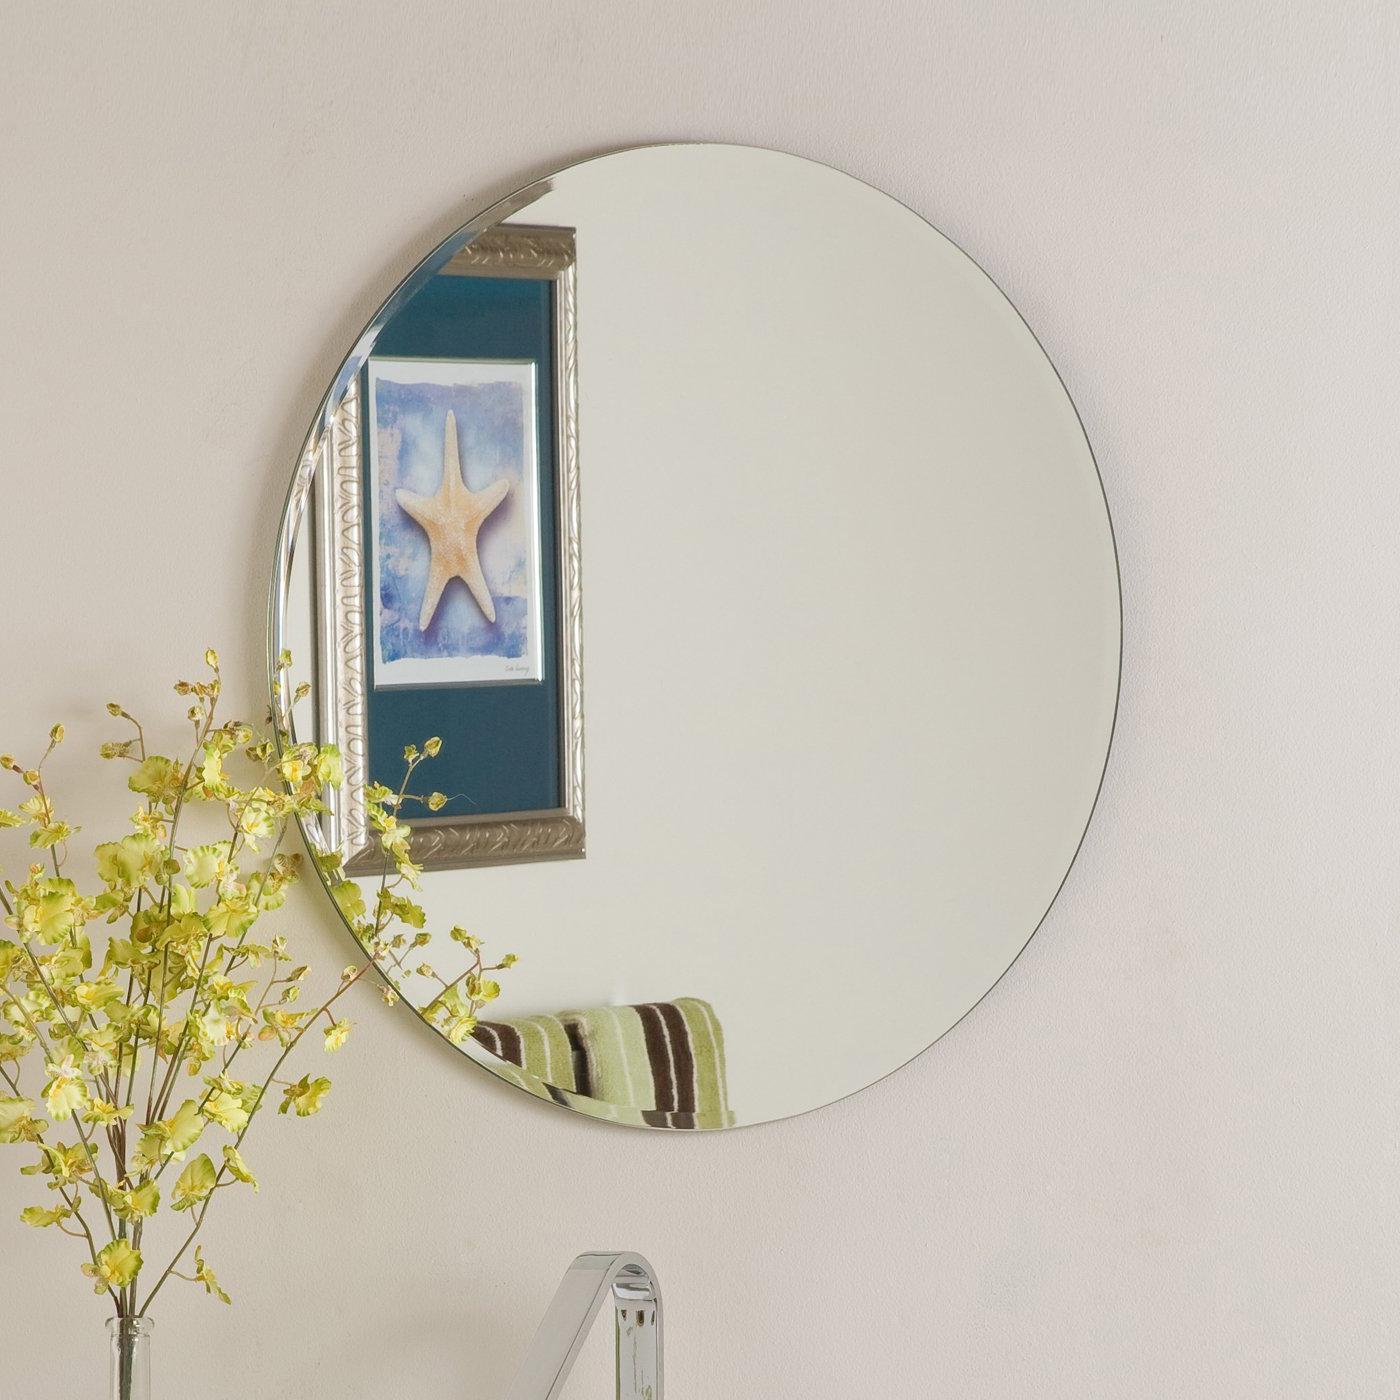 Round Beveled Wall Mirrors Regarding Most Recent Decor Wonderland Frameless Round Beveled Mirror (View 4 of 20)